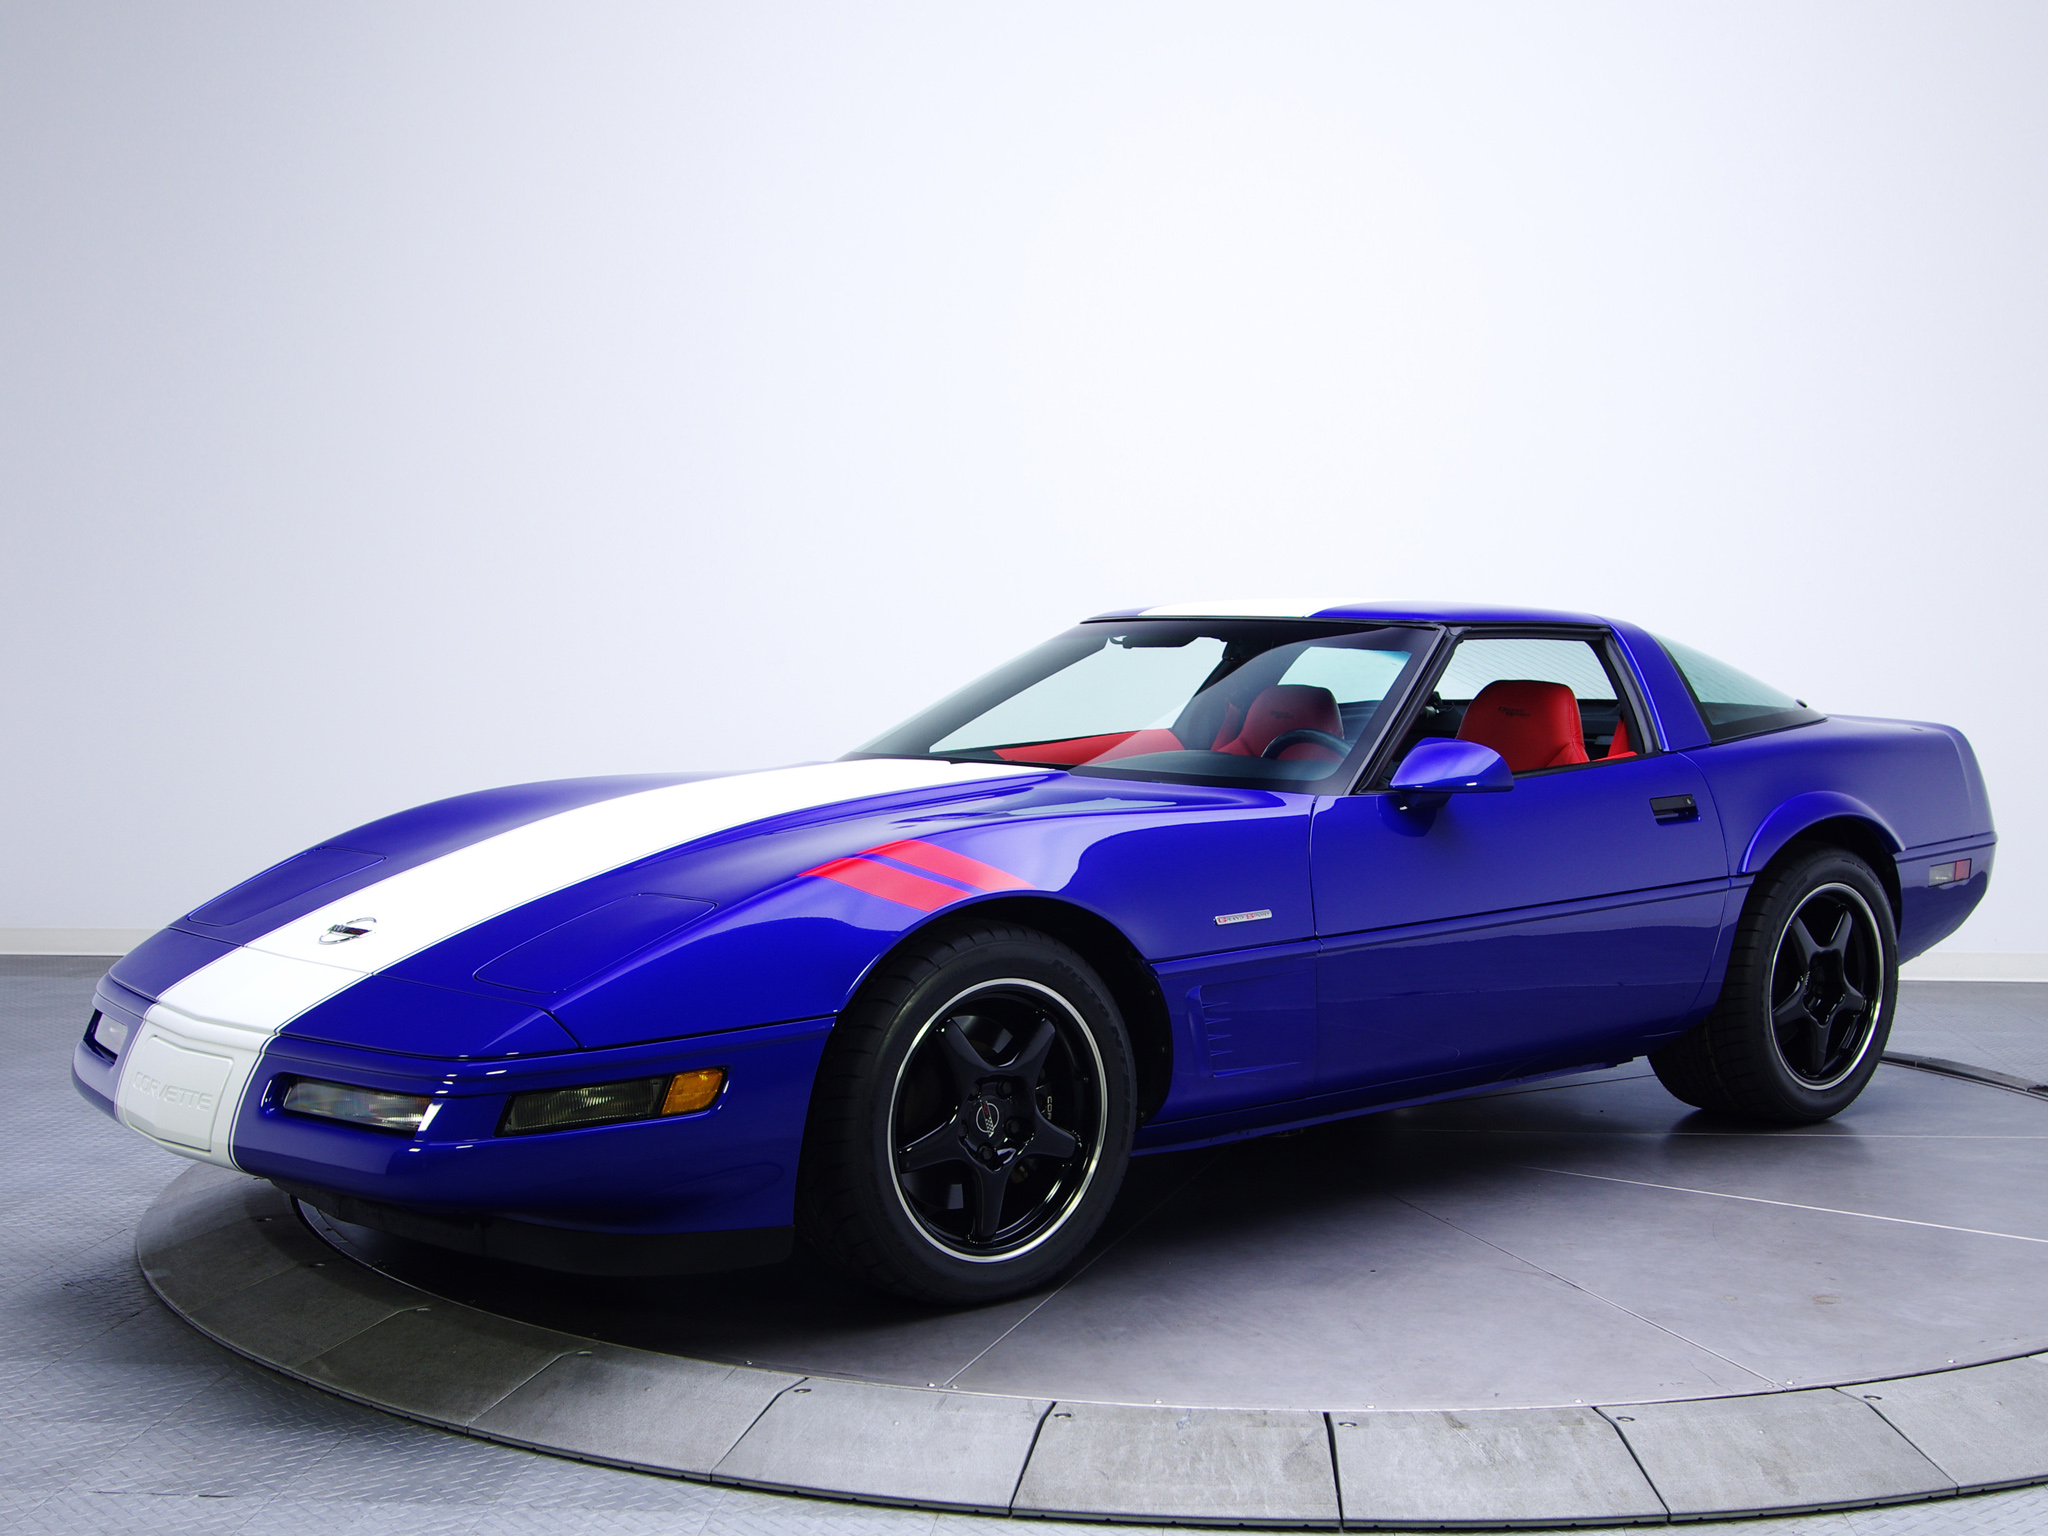 Corvette Grand Sport Iphone Wallpaper: 1996 Corvette Grand Sport Coupe C-4 Supercar Supercars